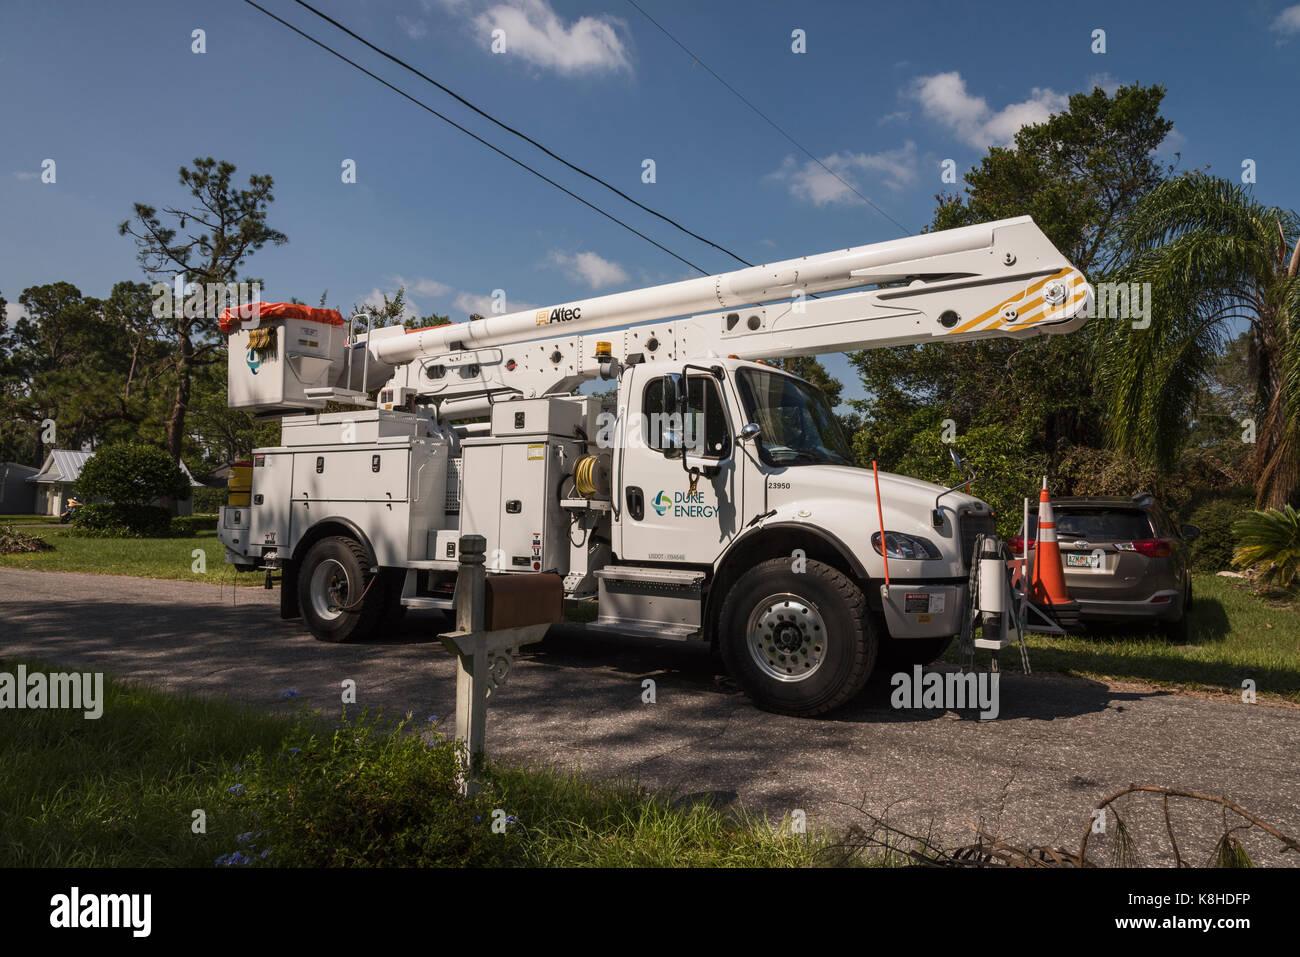 Duke Energy working on restoring electric after Hurrivcane